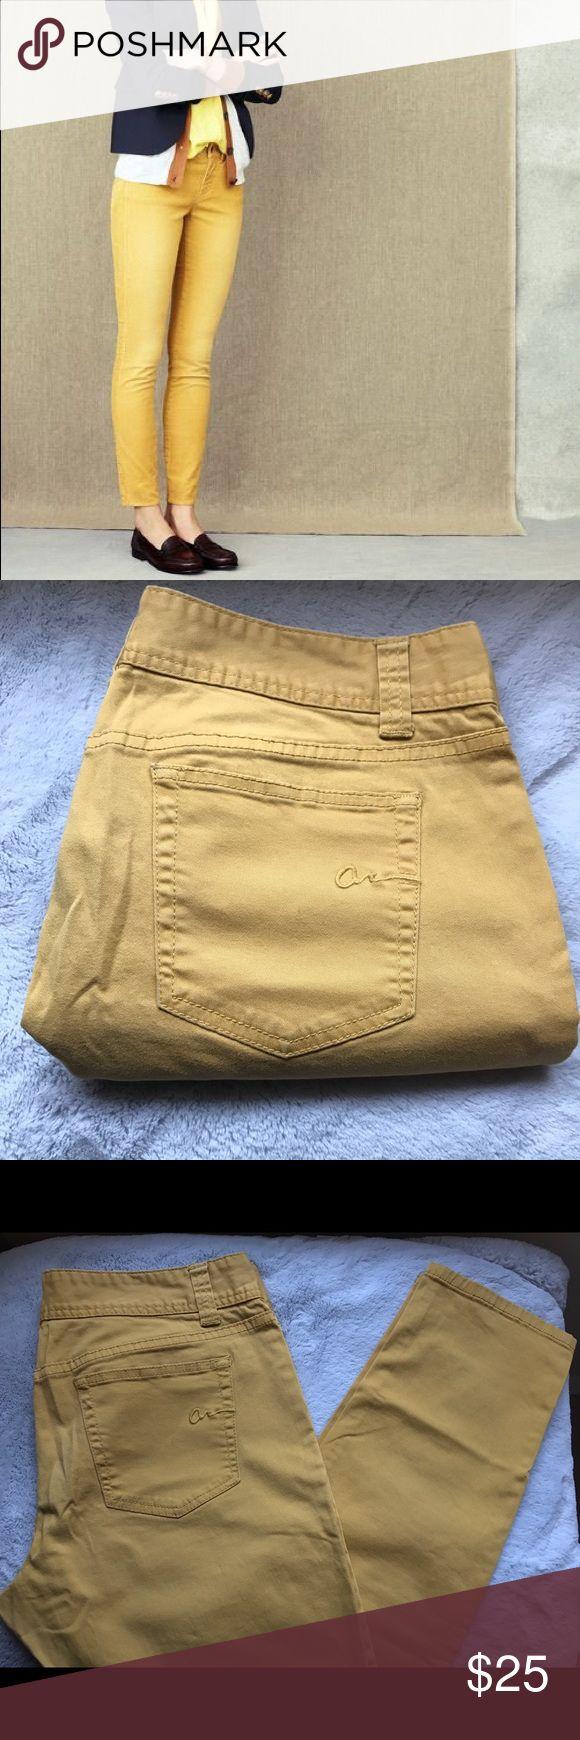 American Rag Jeans American Rag Jeans. Mustard Yellow / Skinny/ Short Length. Junior's Size. Great Condition. American Rag Jeans Skinny